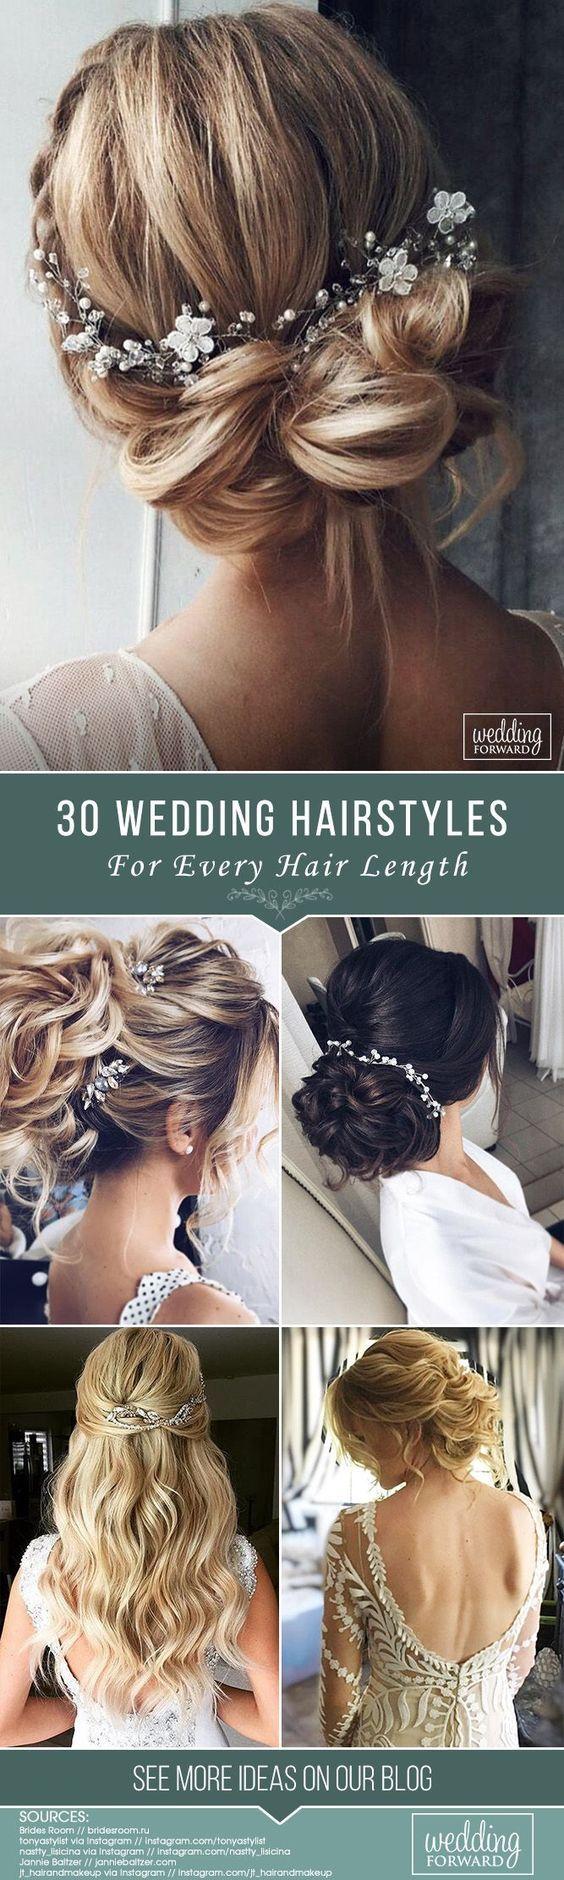 stunning wedding hairstyles creation of wedding hairstyle needs